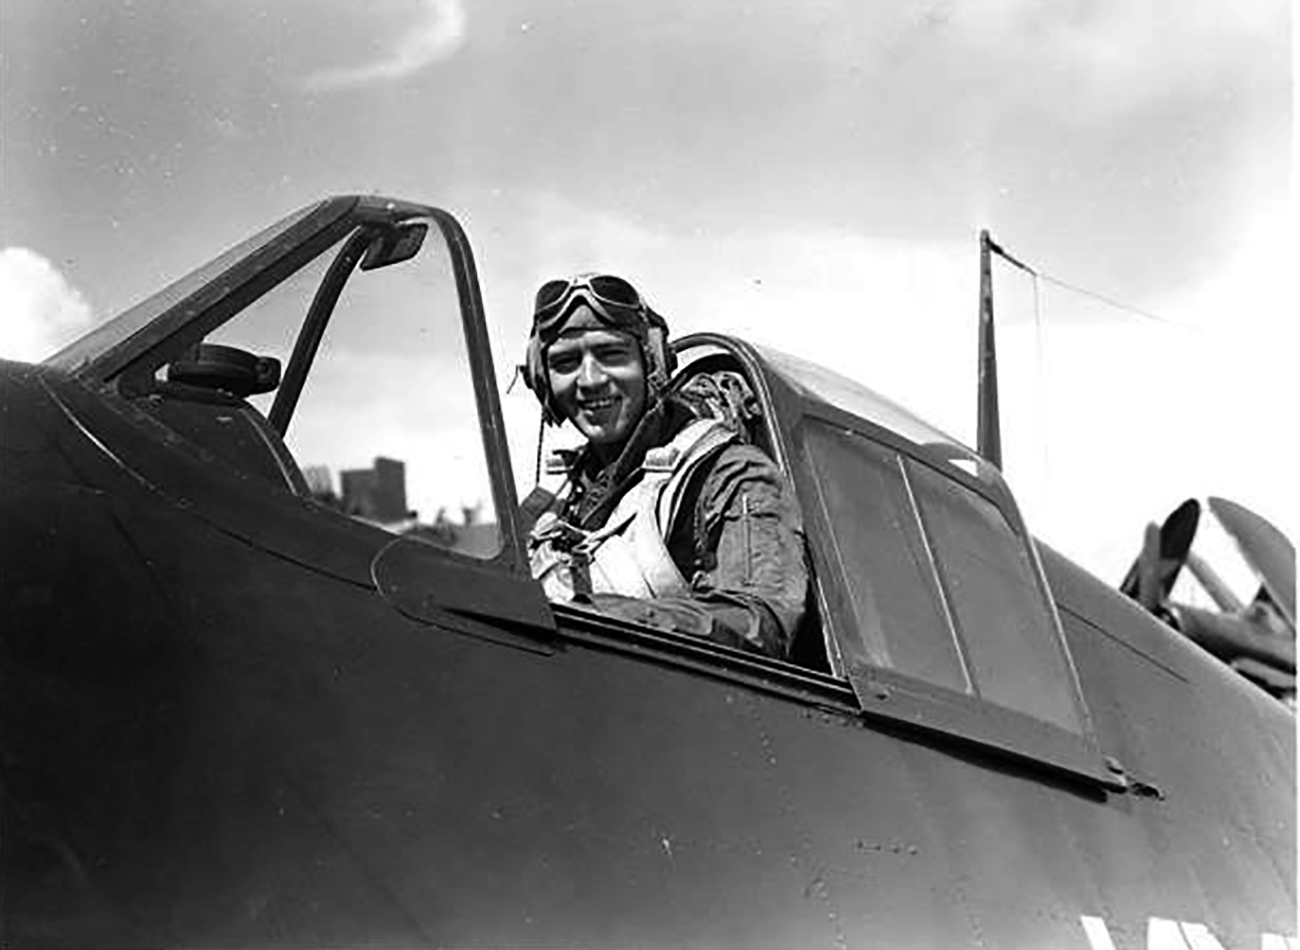 Aircrew USN Ens William J Kingston Jr VF 83 01